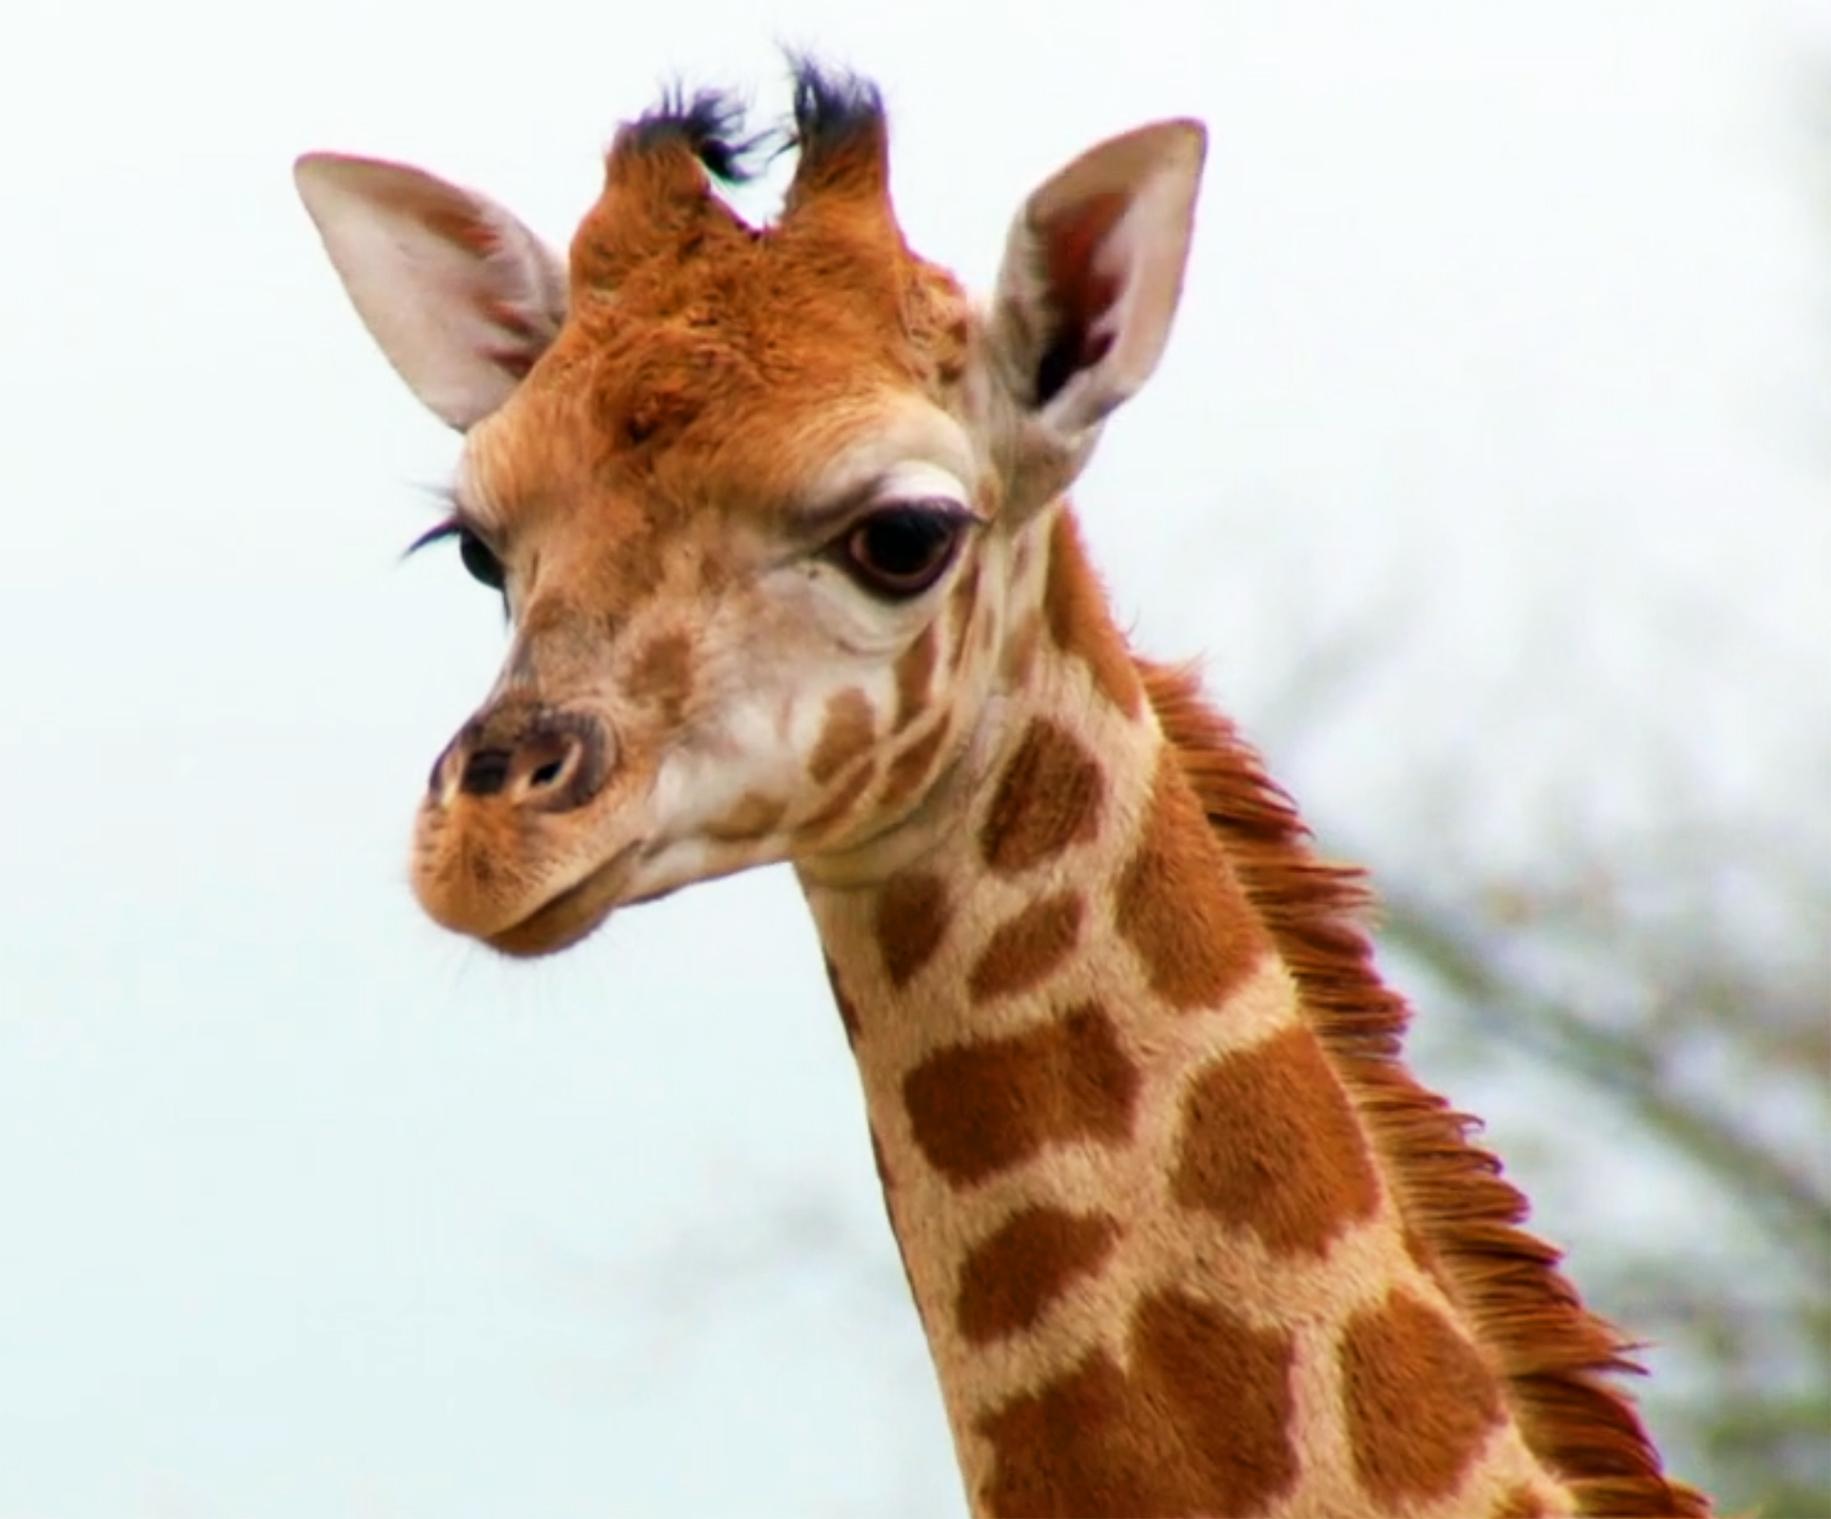 Head of giraffe